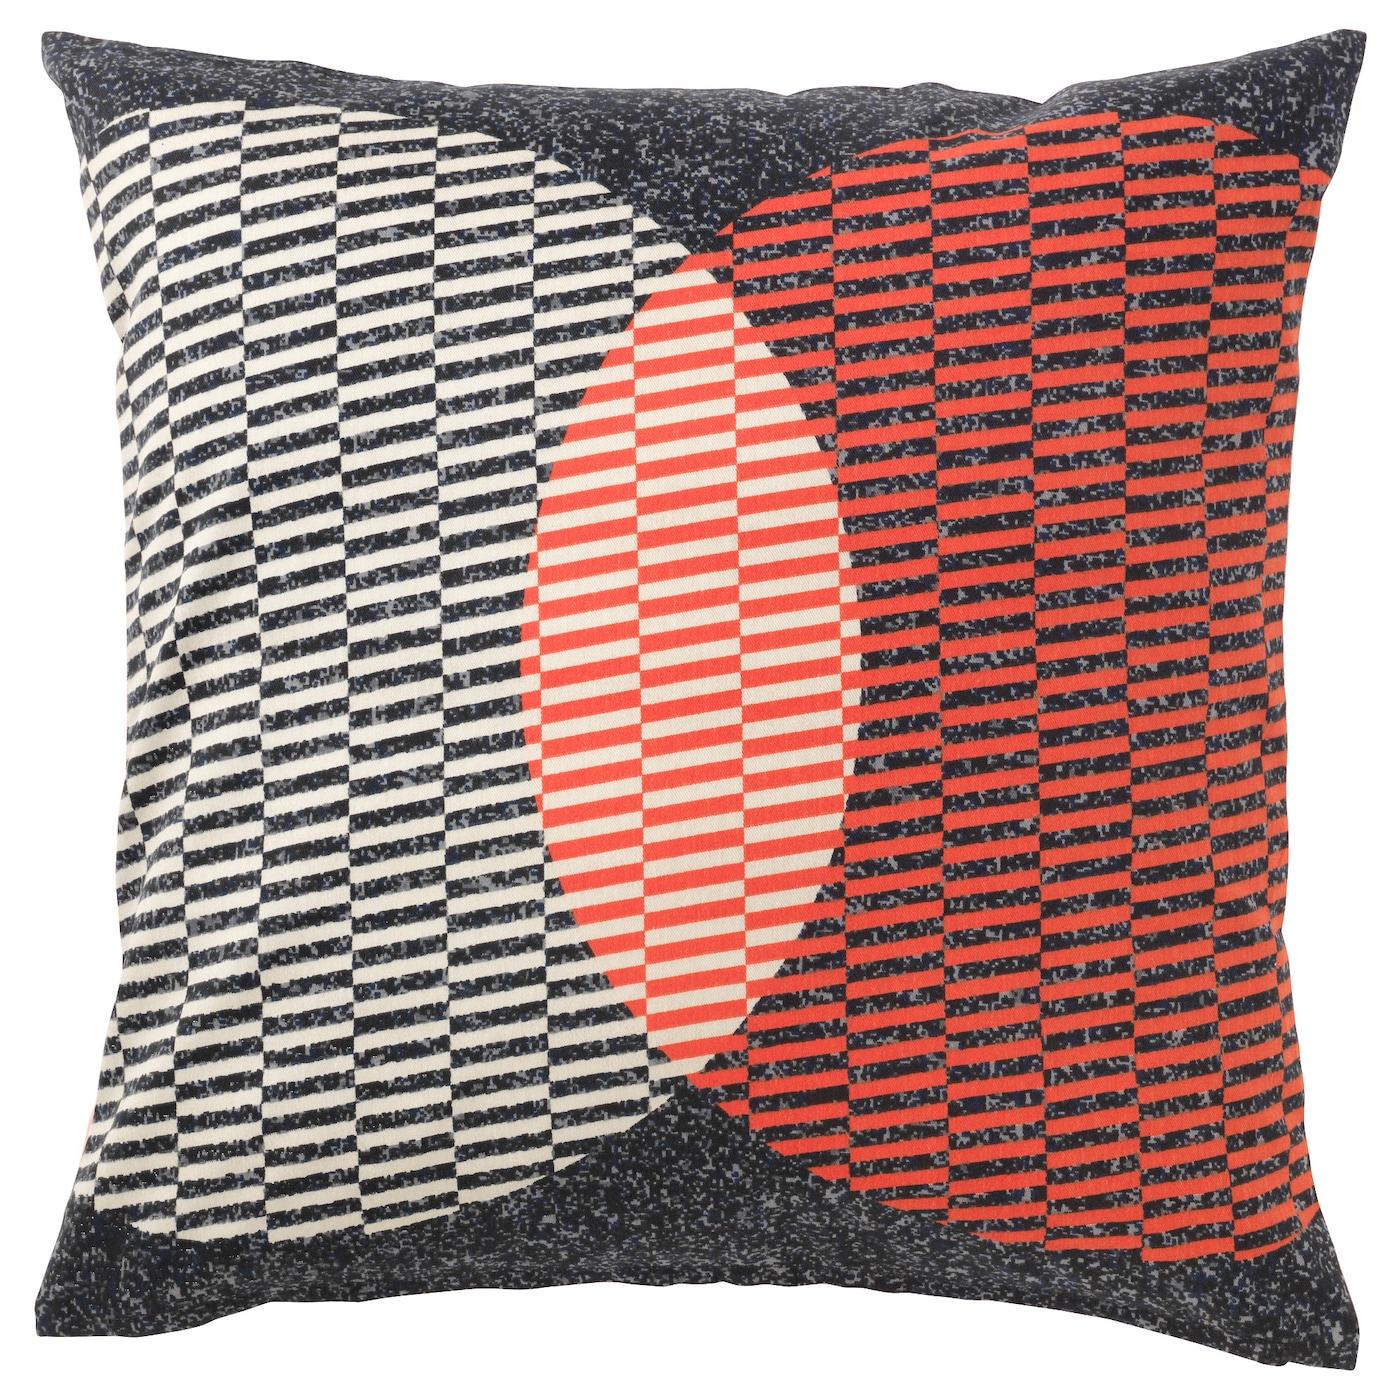 SANELA Cushion cover Orange 50x50 cm IKEA